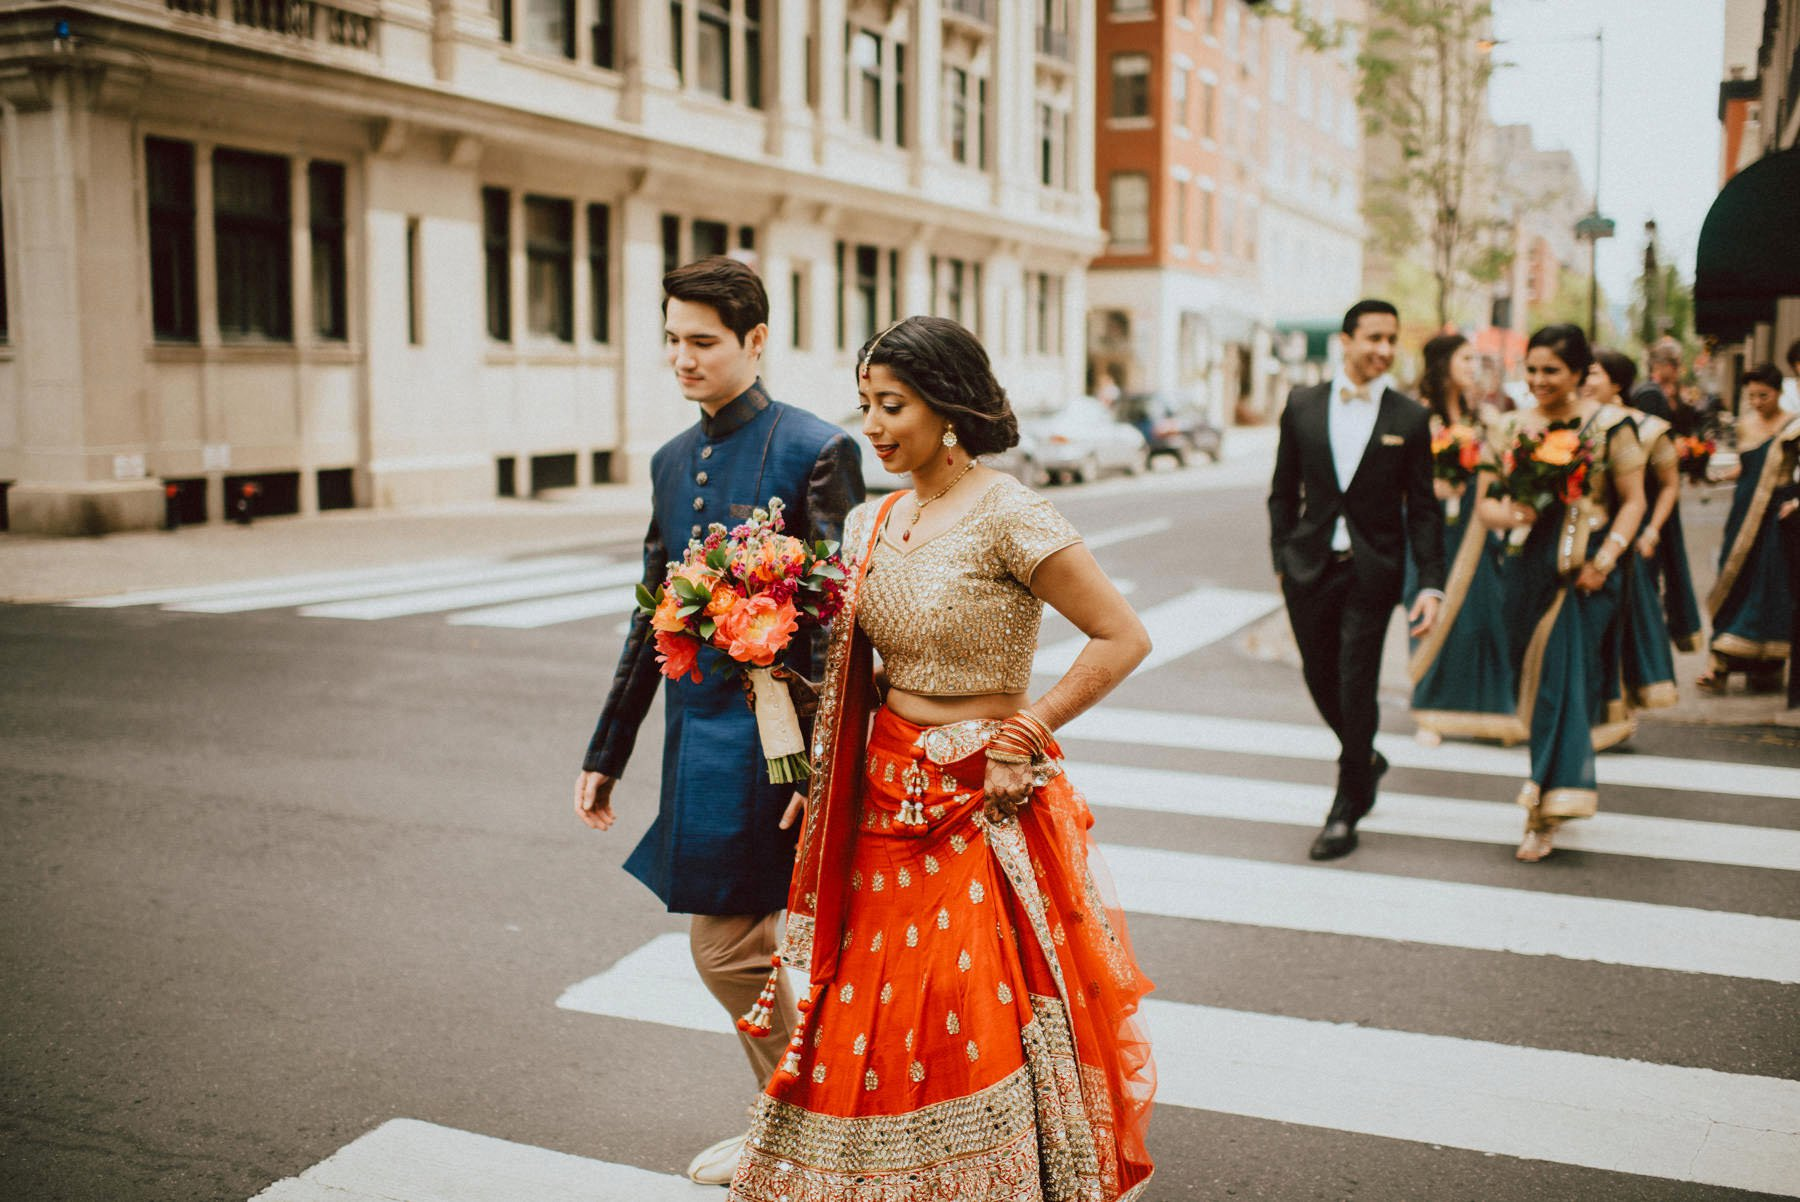 vie-philadelphia-indian-wedding-36.jpg